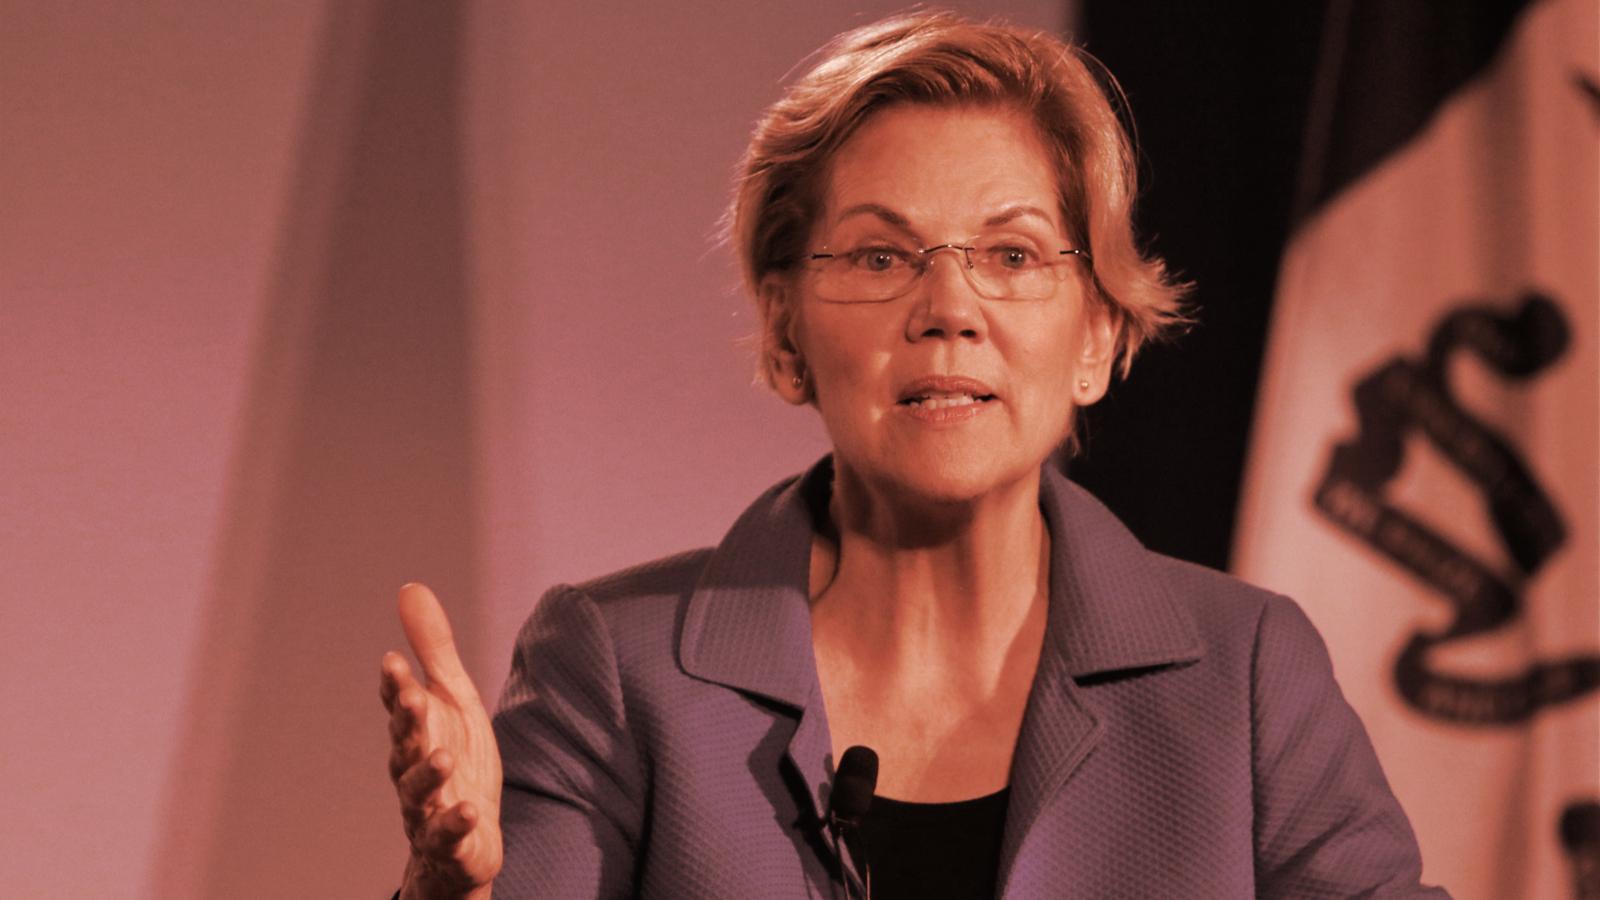 Sen. Elizabeth Warren: Crypto Puts Financial System in the Hands of 'Shadowy Super-Coders'